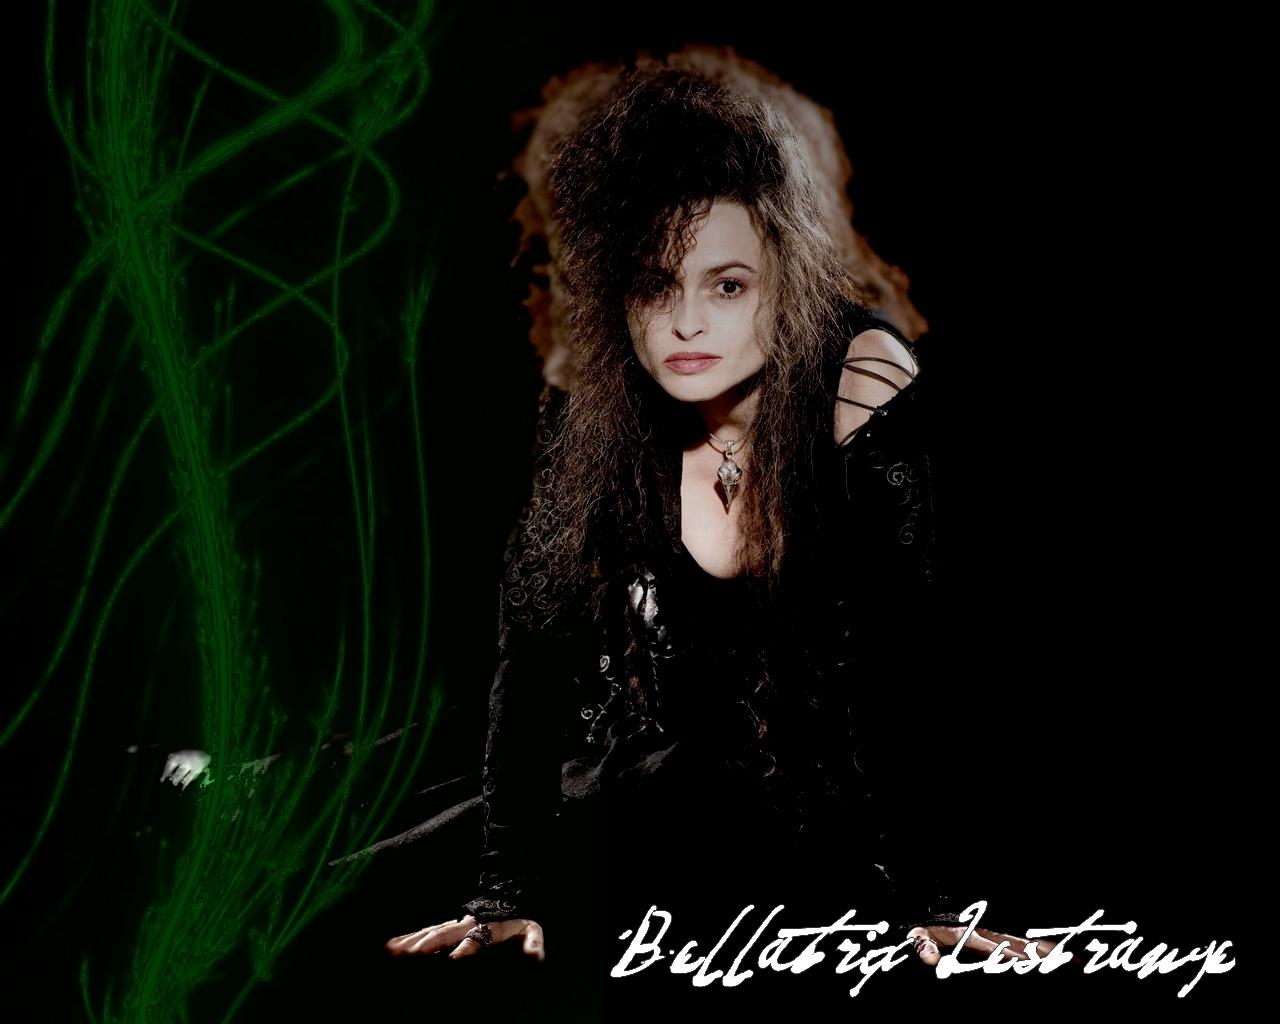 bellatrix lestrange images - HD1280×1024